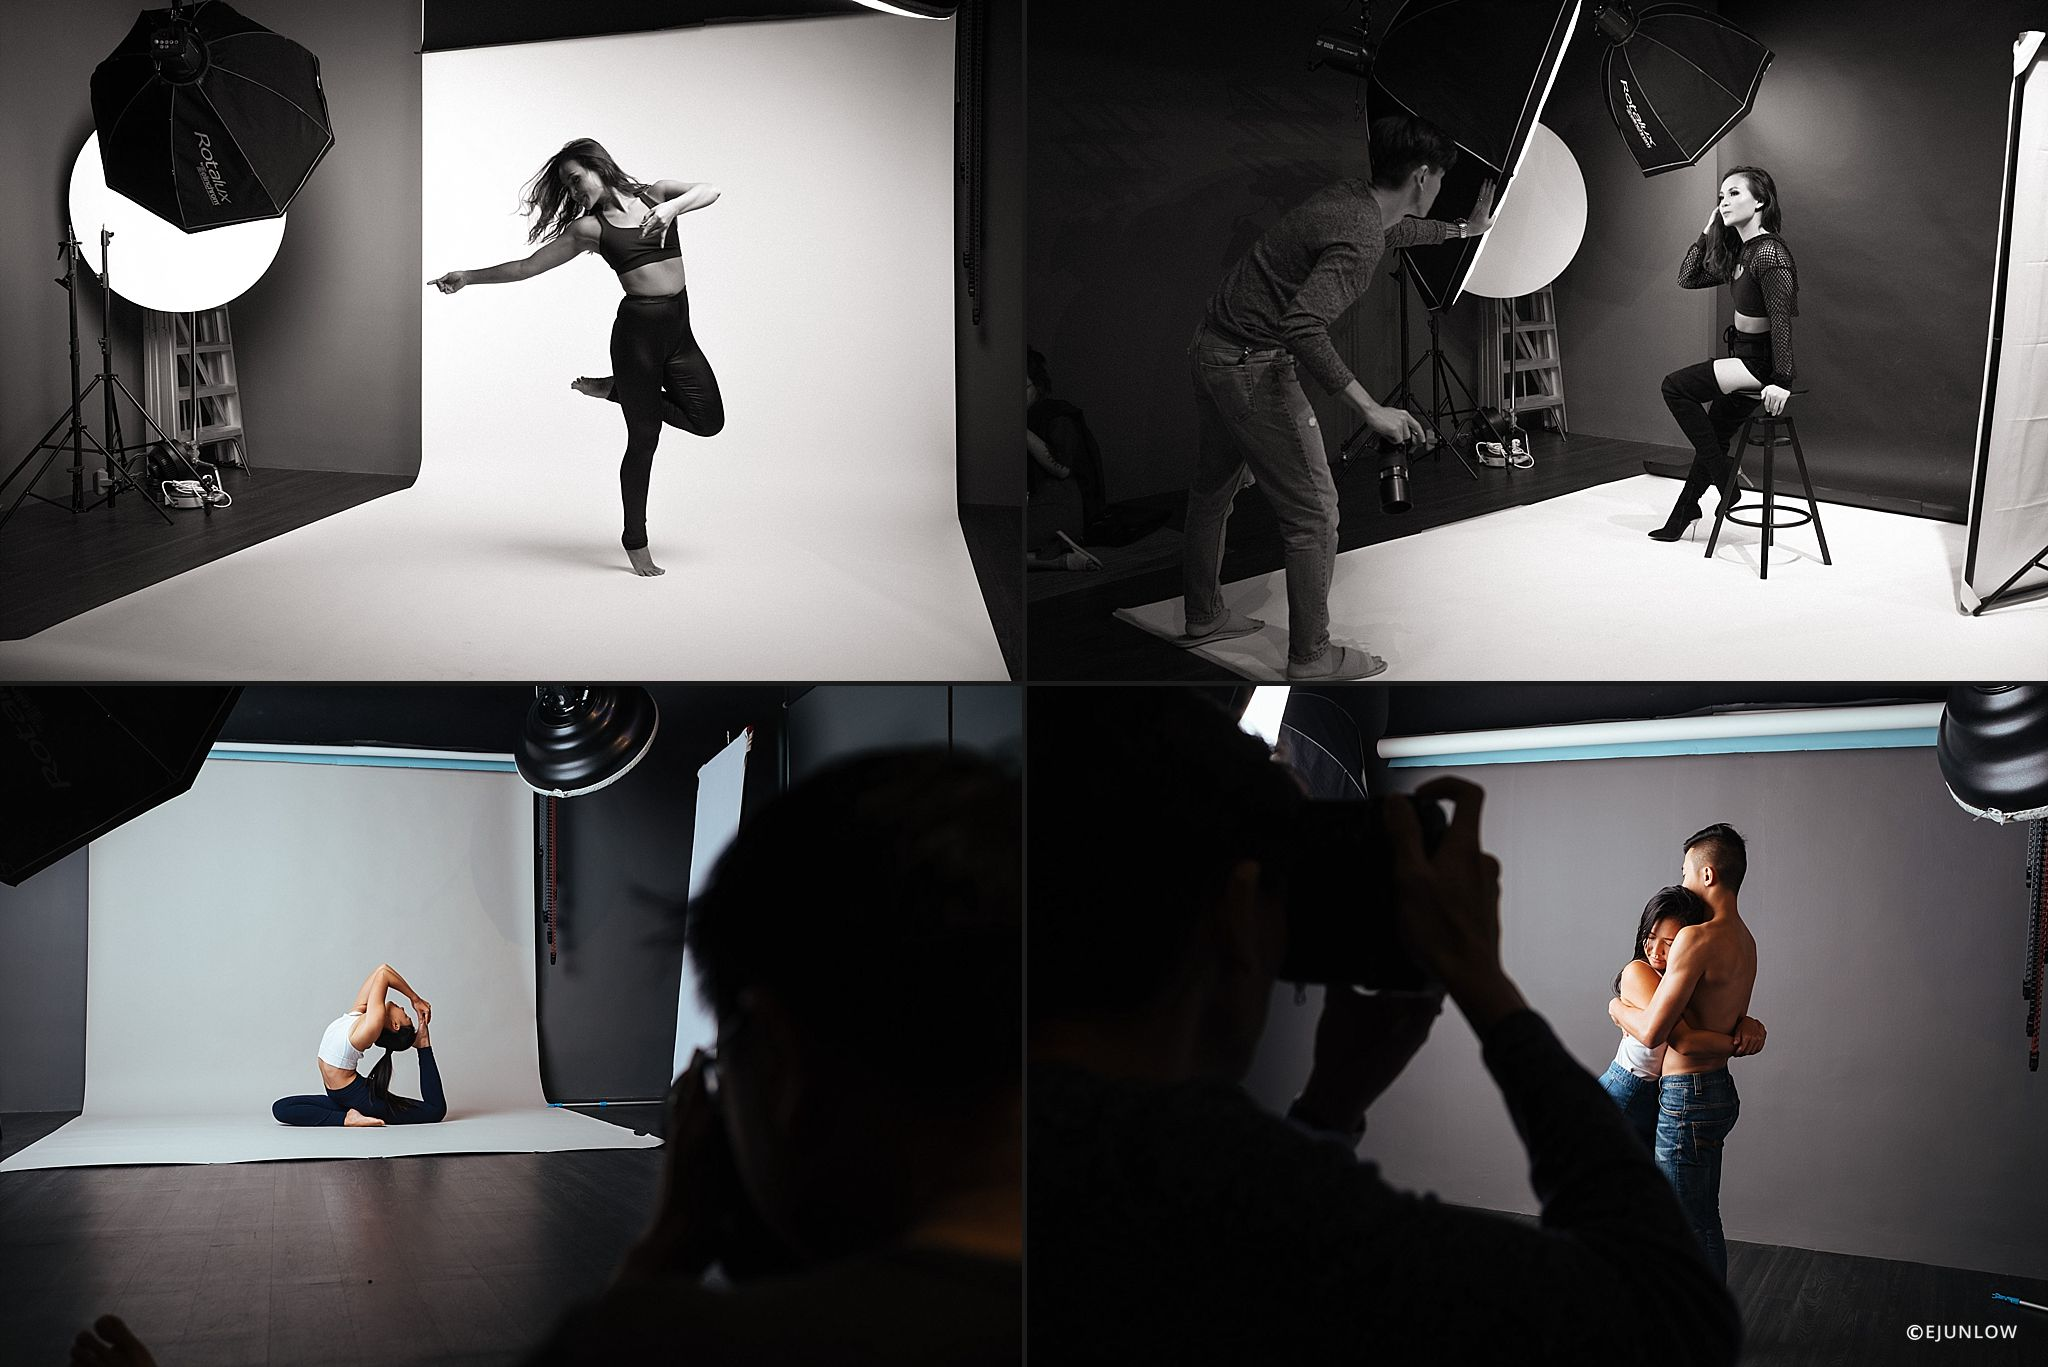 Behind The Scenes during workshops